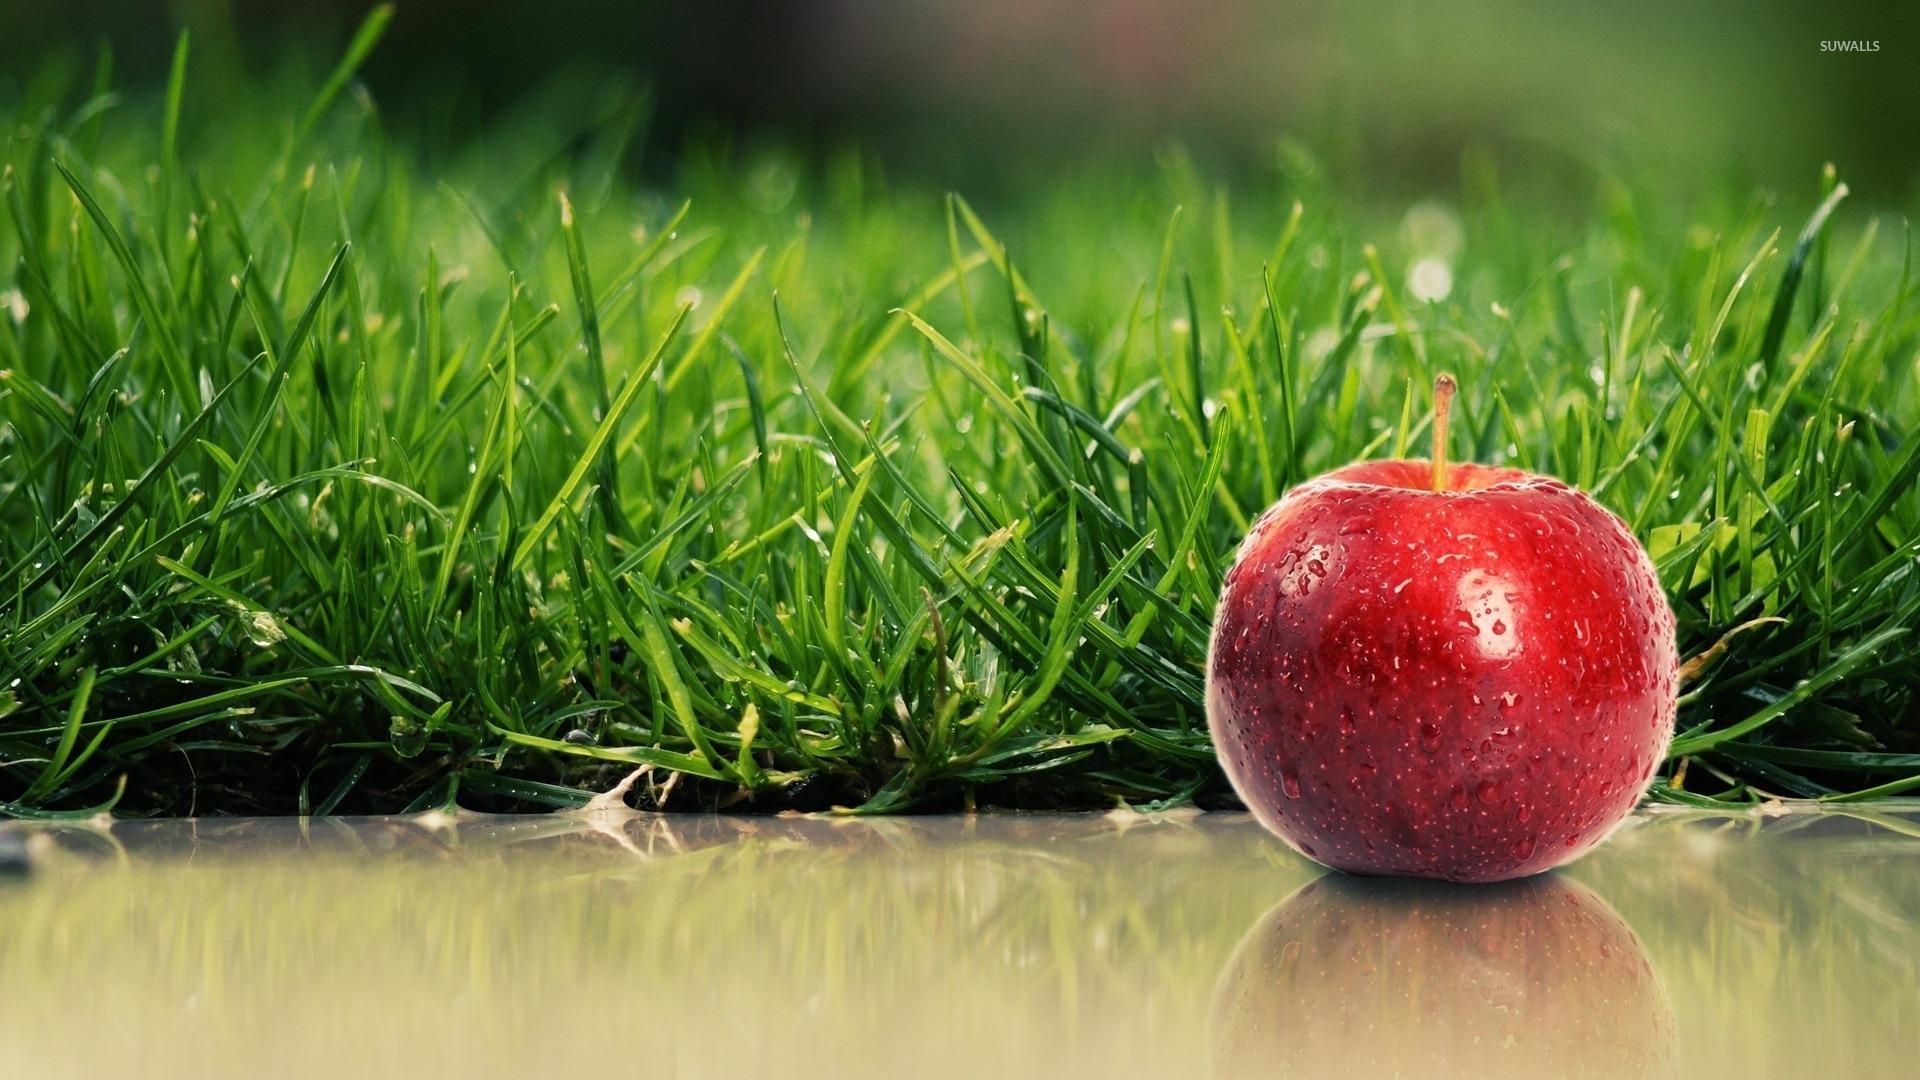 apple fruit background grass - photo #5